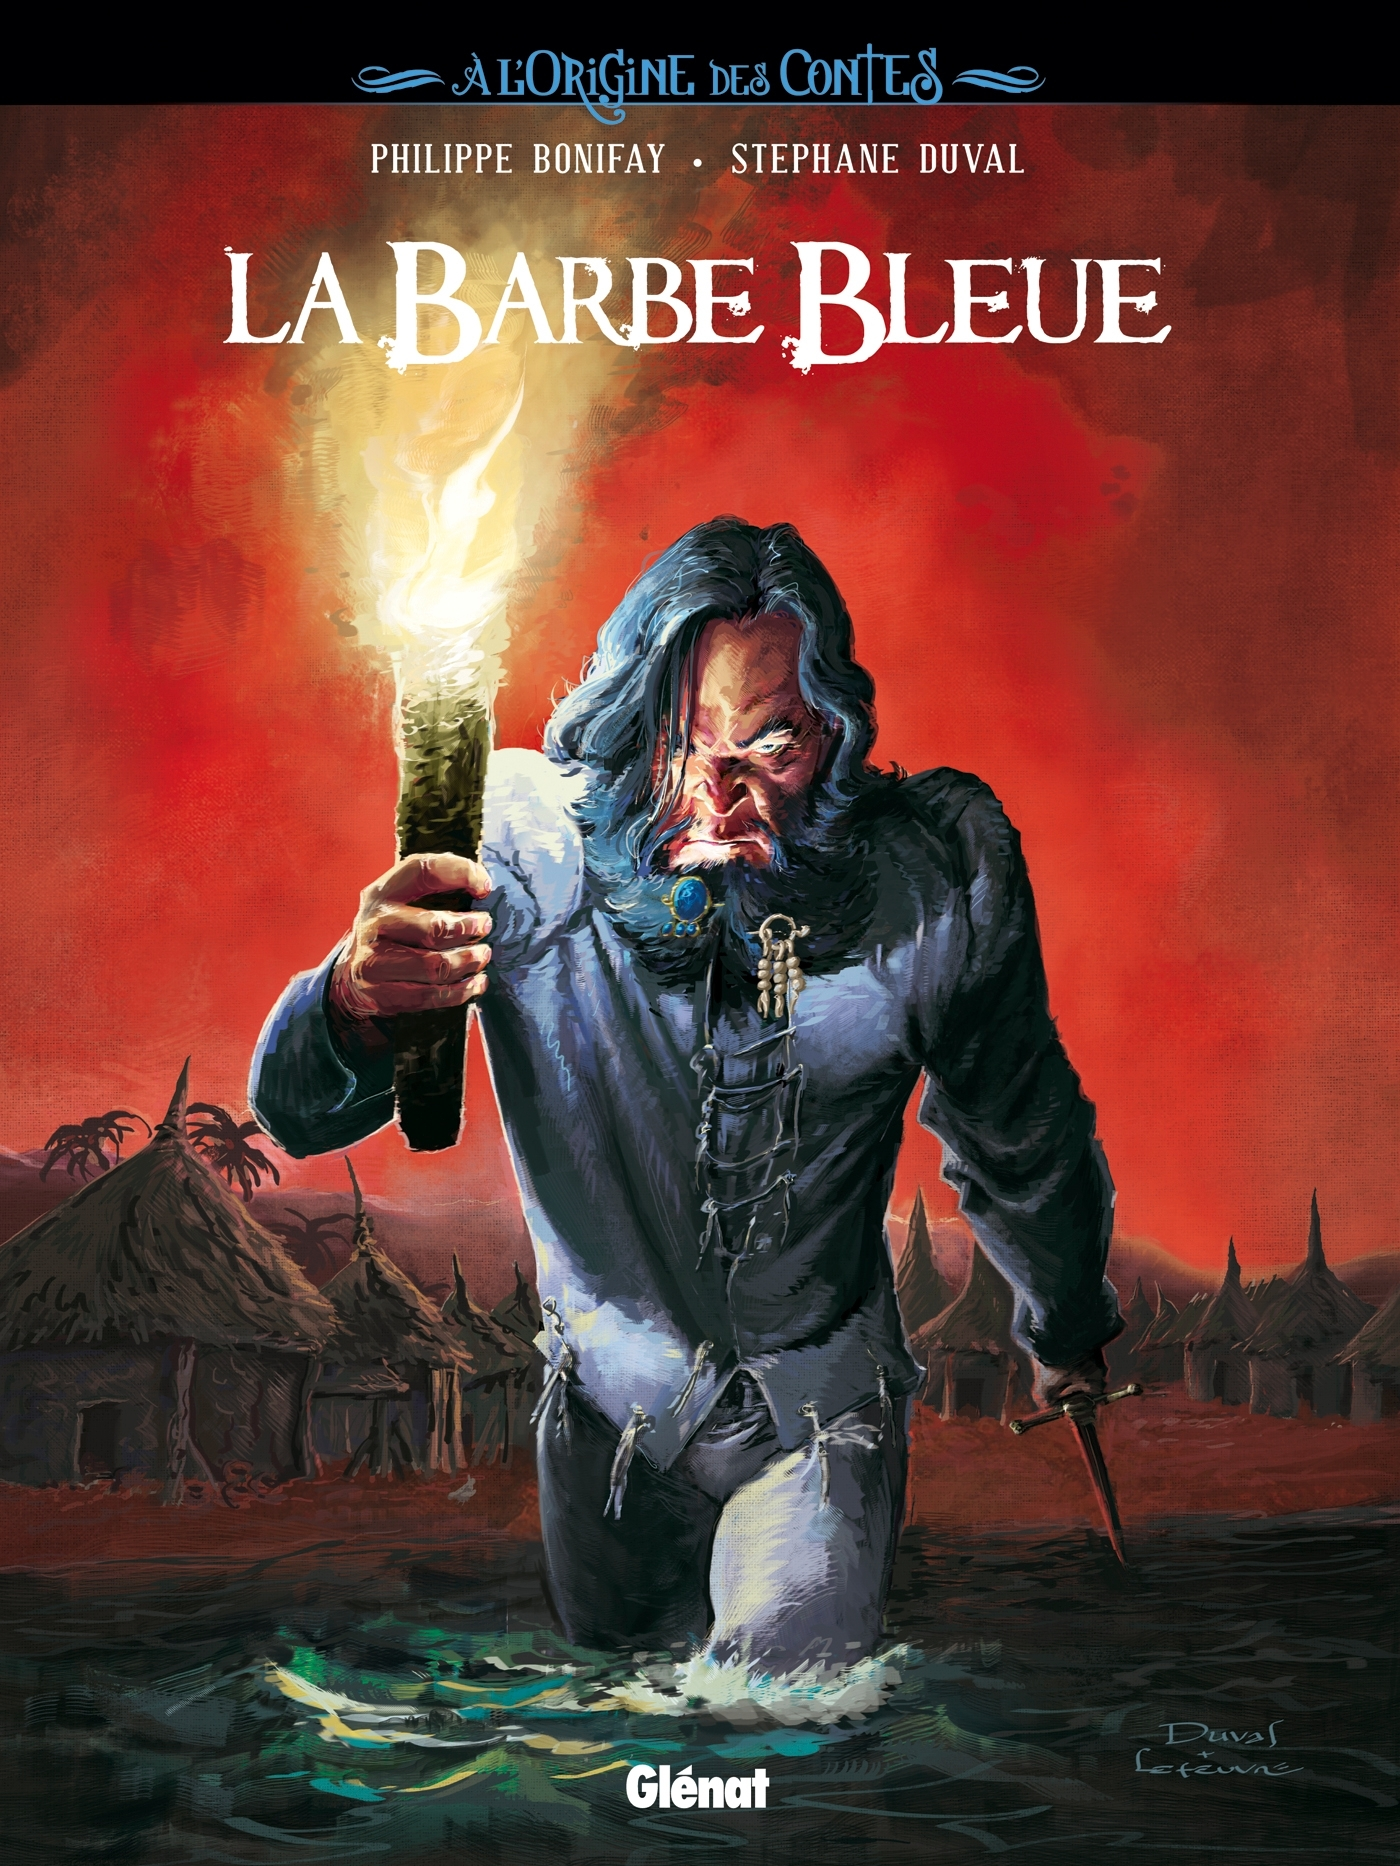 A L'ORIGINE DES CONTES - LA BARBE BLEUE